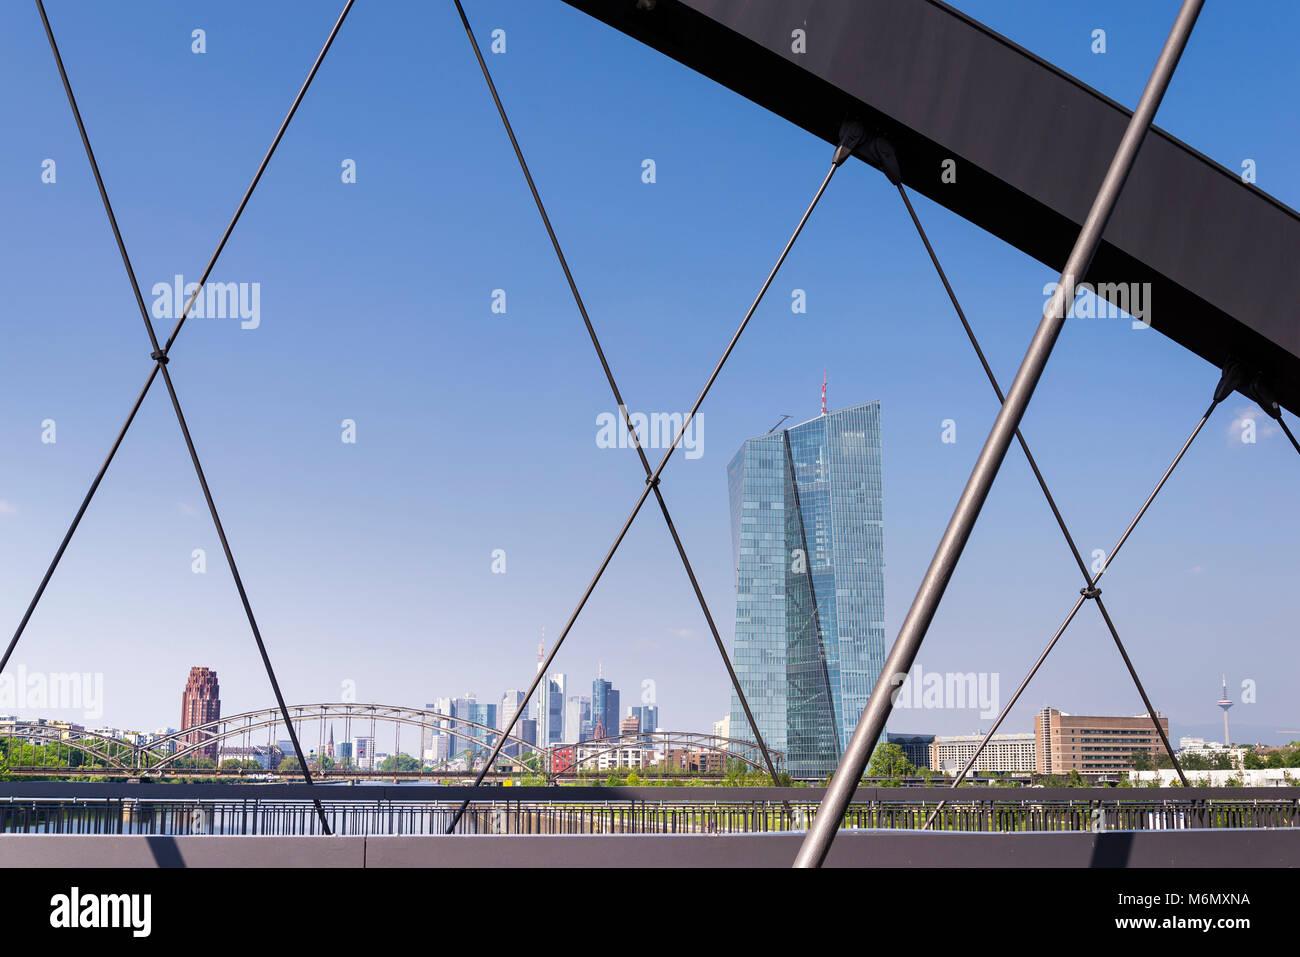 EZB, Europäische Zentralbank, Frankfurt, Hessen, Deutschland, Europa Stock Photo